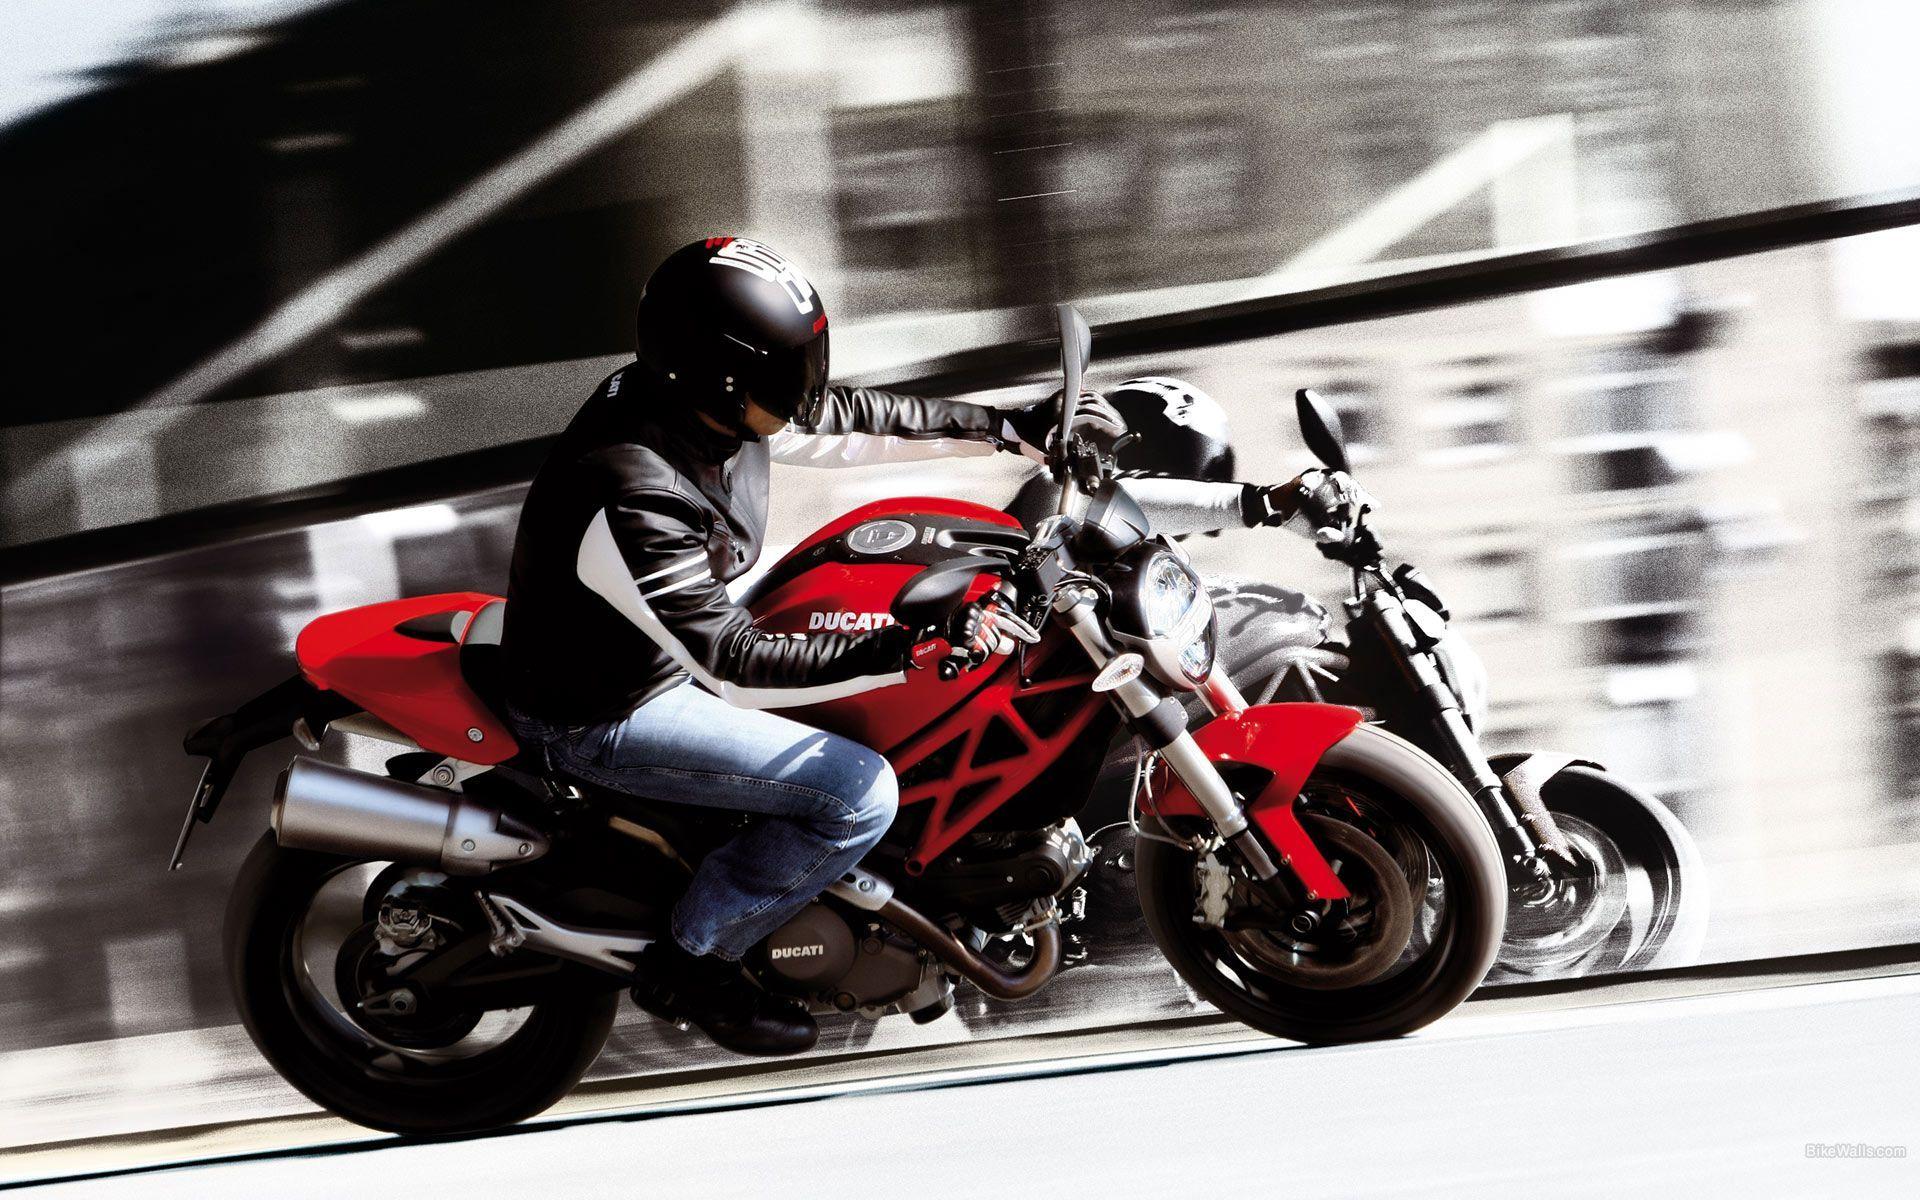 Ducati Monster With Termignoni Exhaust Wishlist Chevrolet Camaro Wallpaper HD Widescreen Wallpapers Car Mens